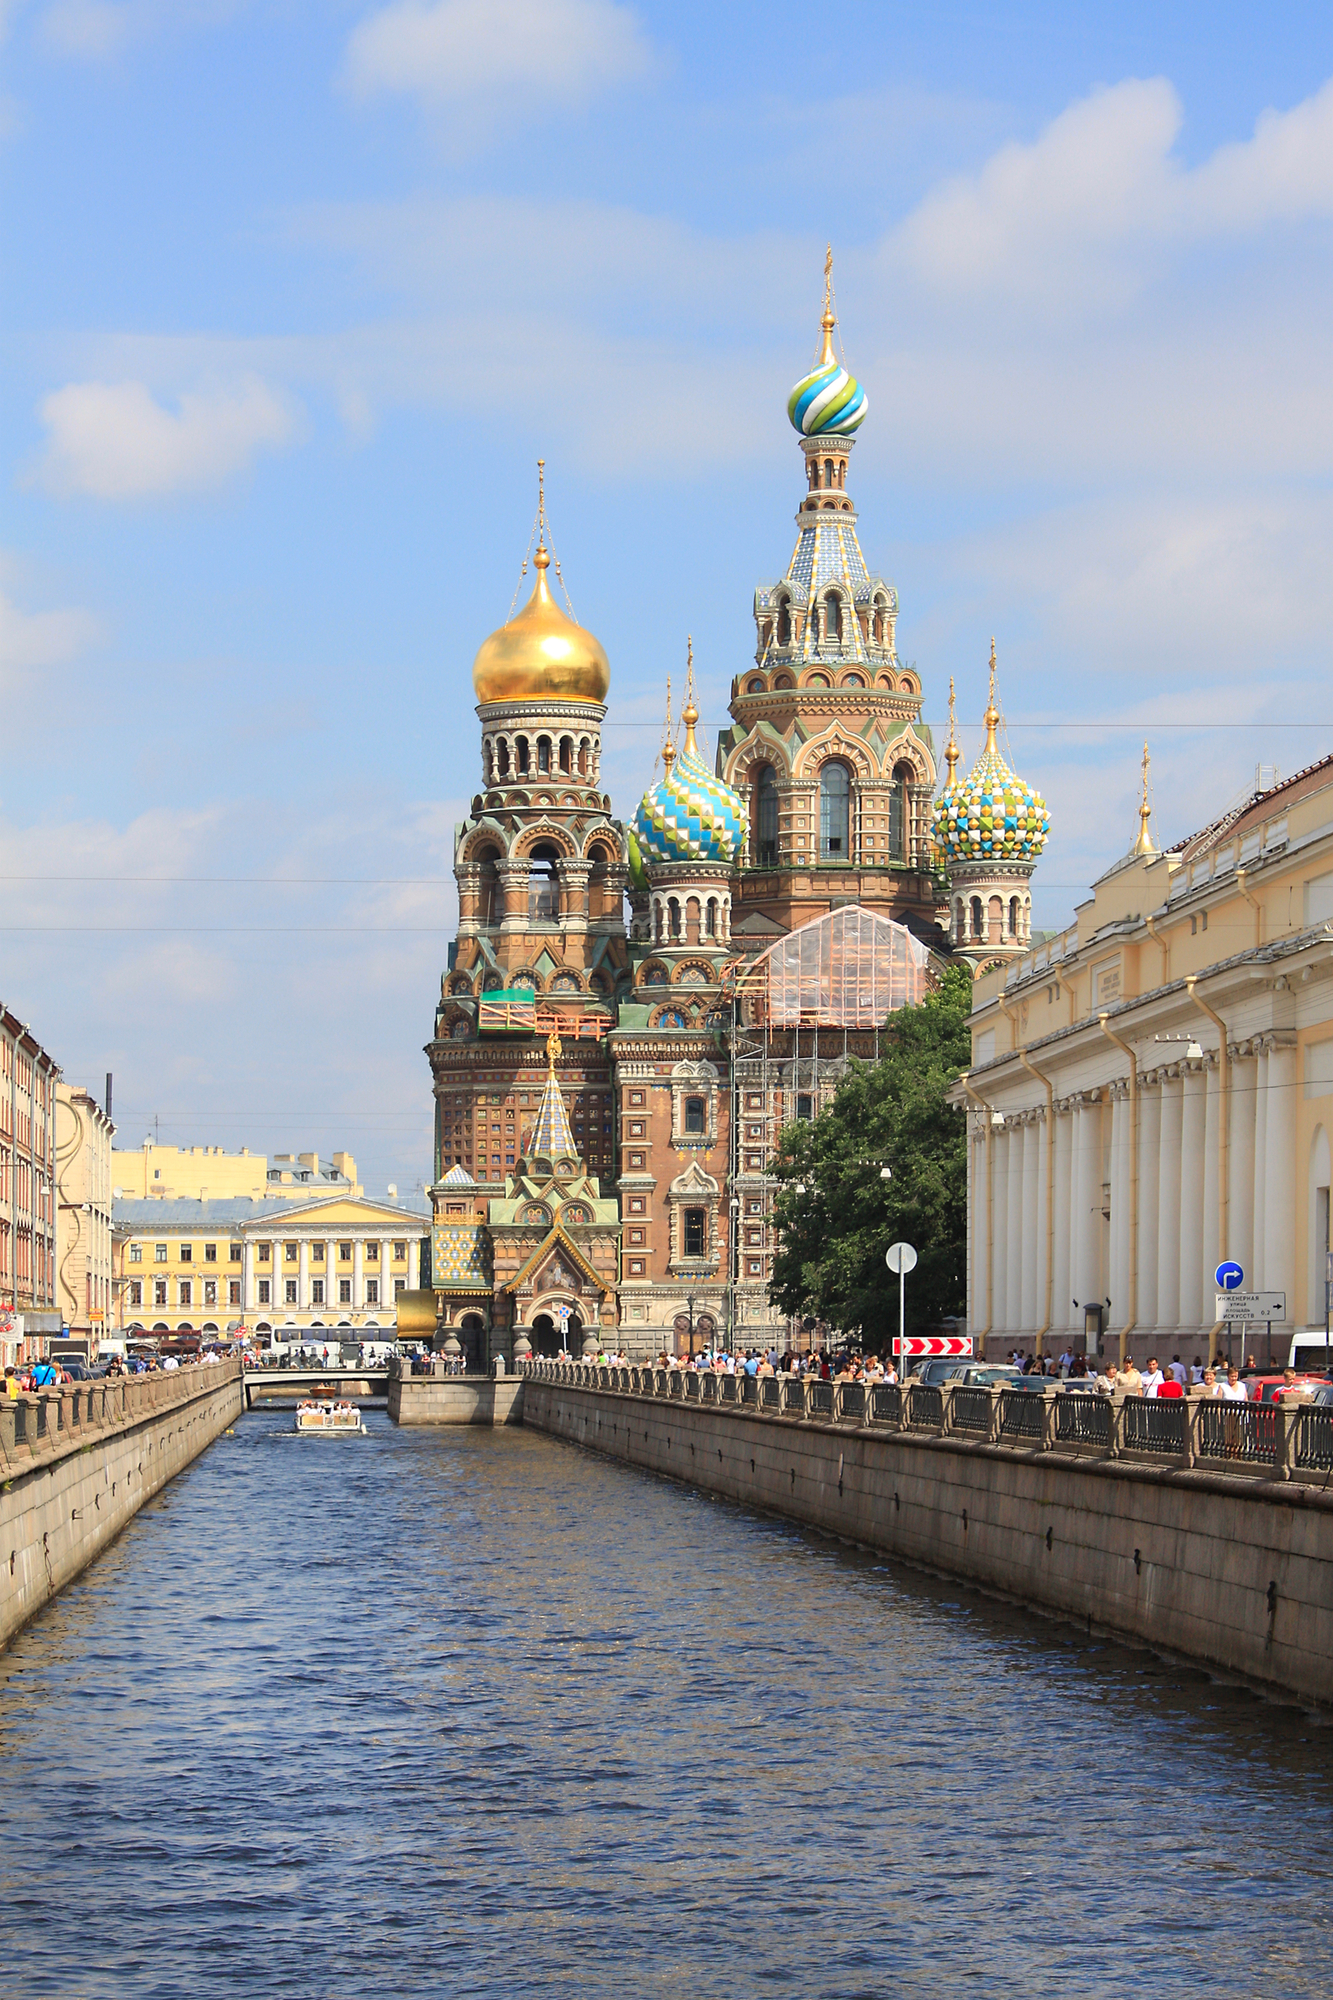 Savior-on-Spilt-Blood-in-Petersburg